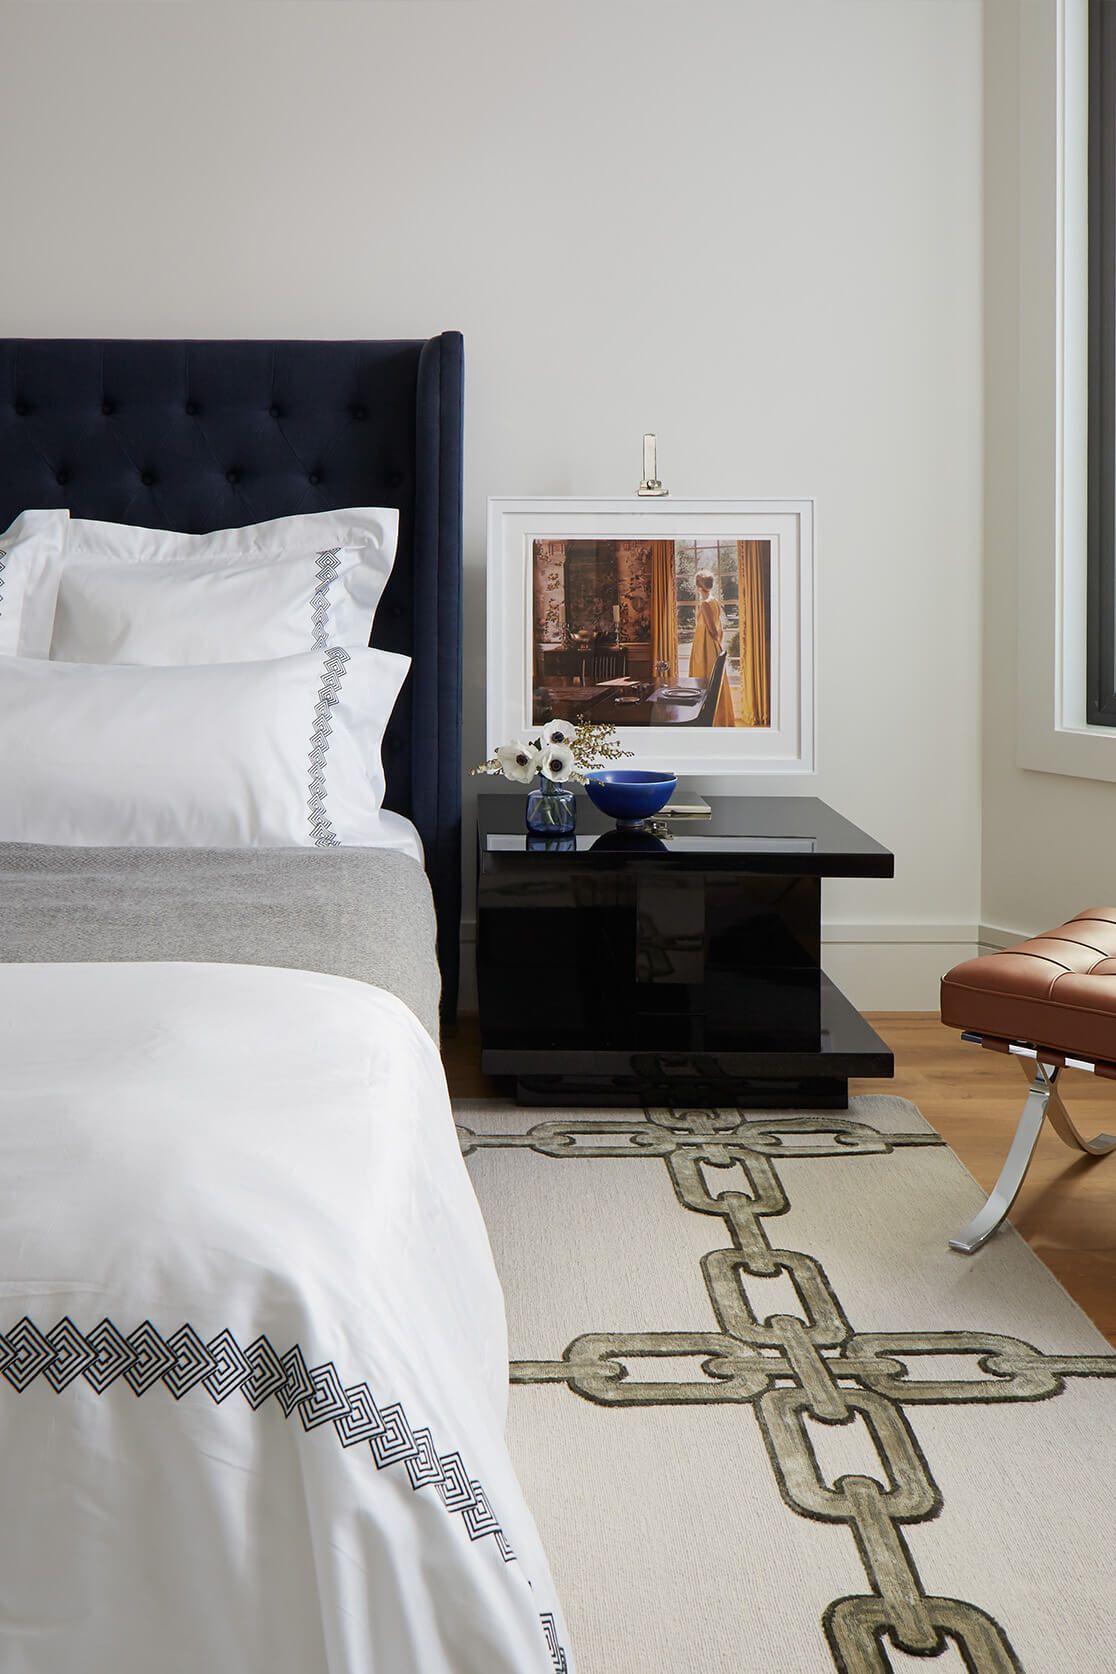 Incredible 50 Stylish Bedroom Design Ideas Modern Bedrooms Download Free Architecture Designs Ogrambritishbridgeorg